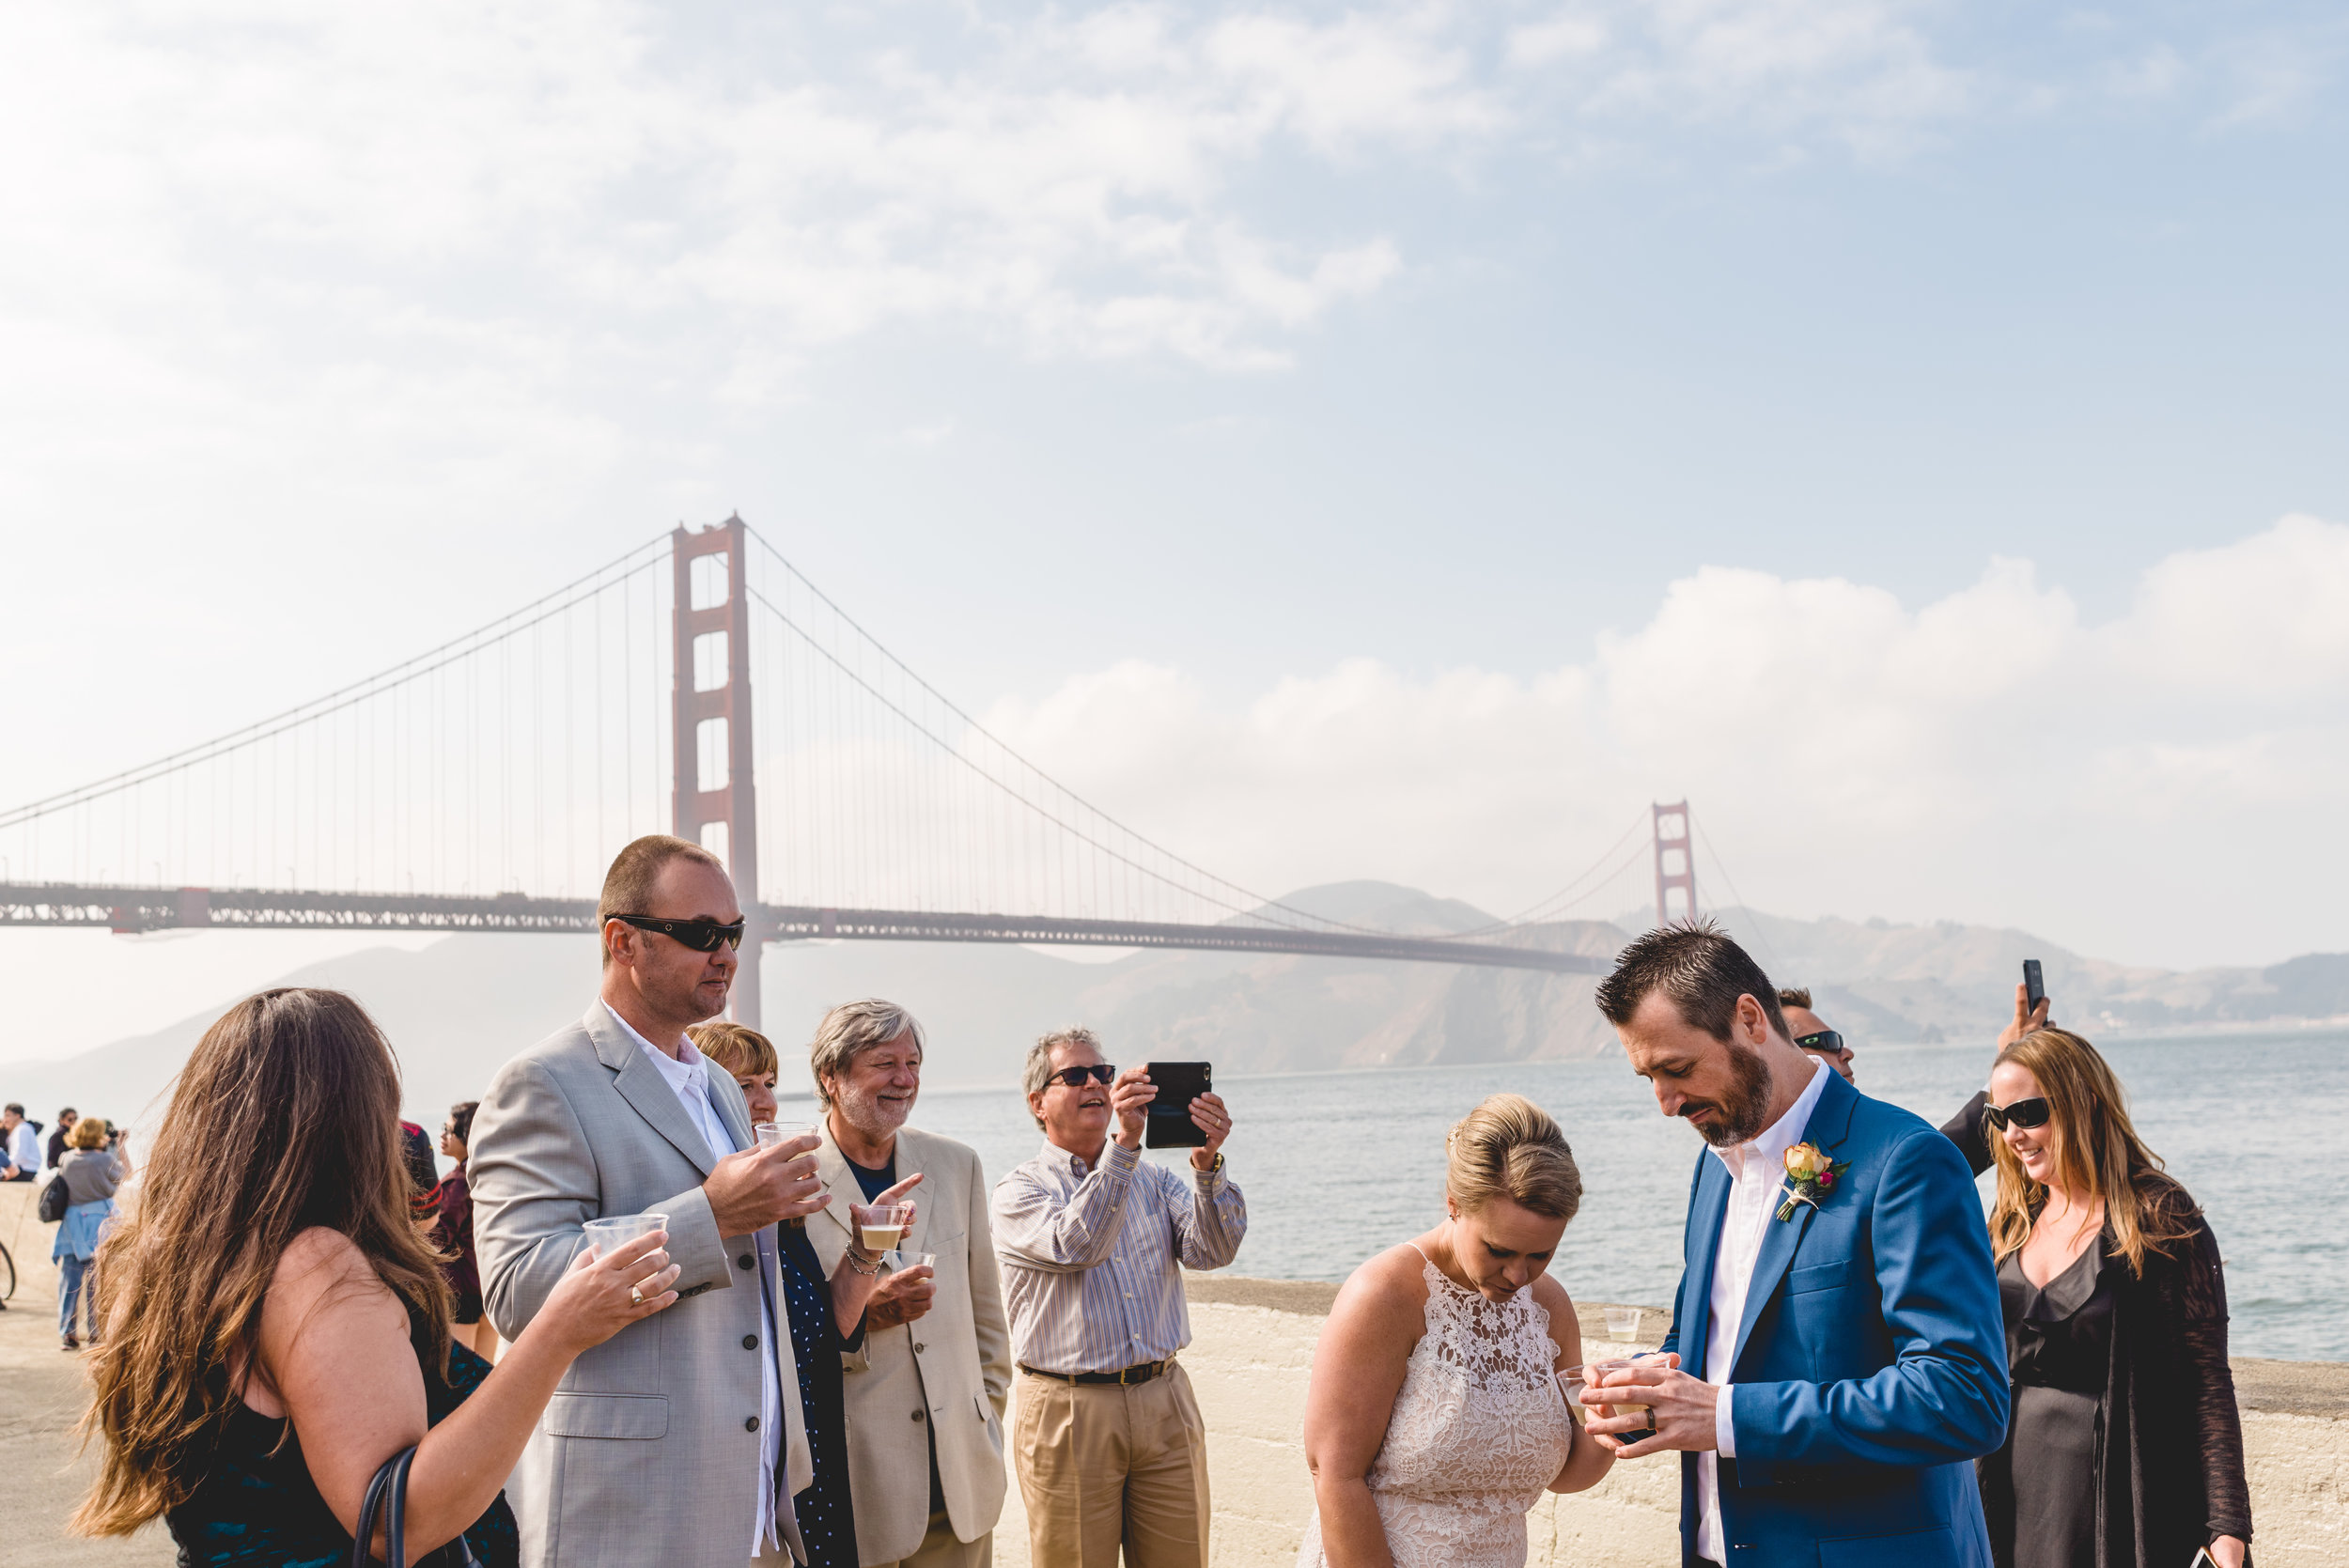 mcdaniels_conroy-wedding-adventure-19.jpg